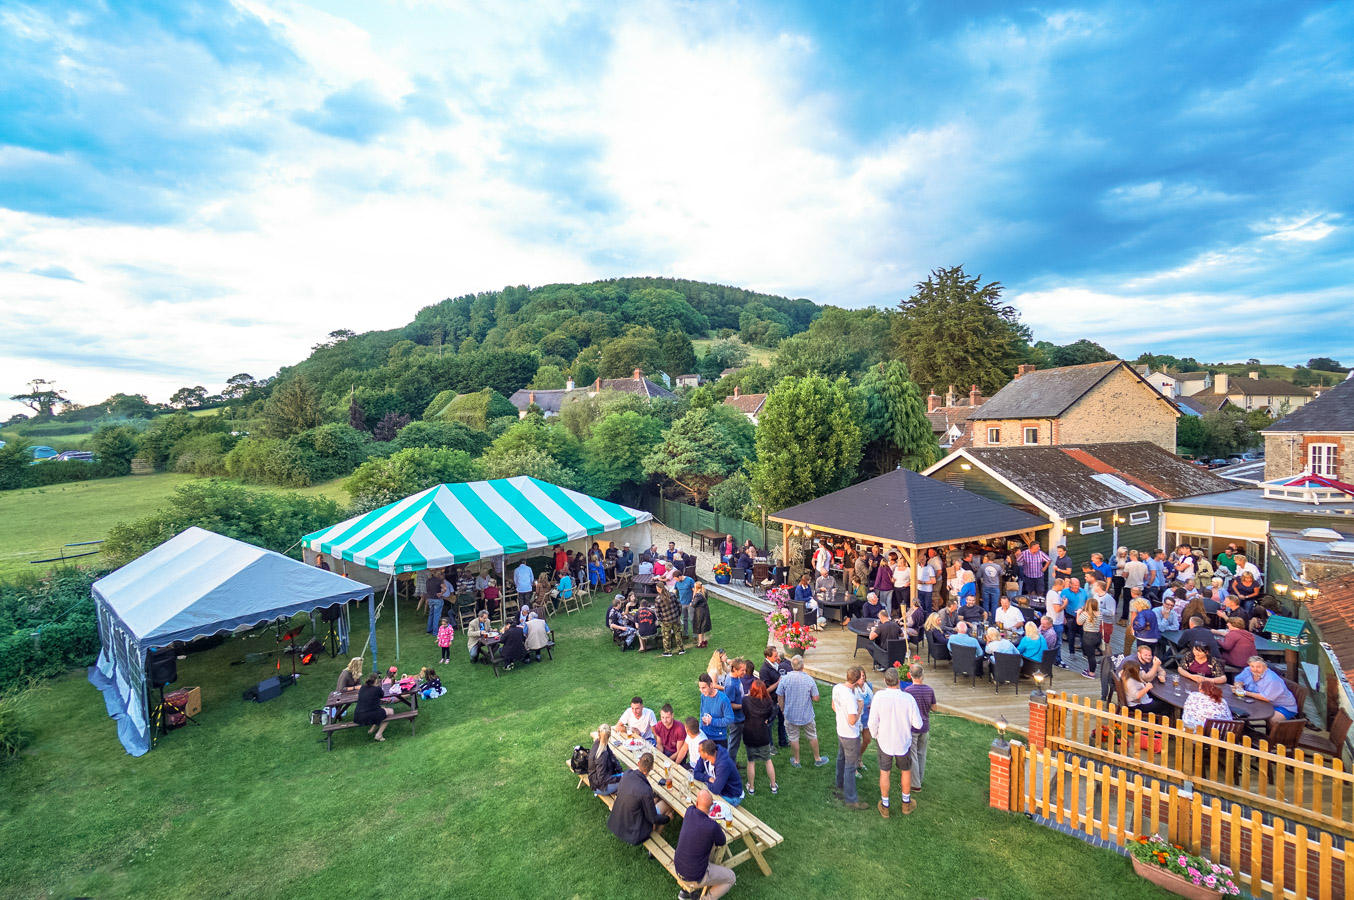 Best-East-Devon-Pub-Ship-Inn-Axmouth-Devon-Beer-Cider-Festival